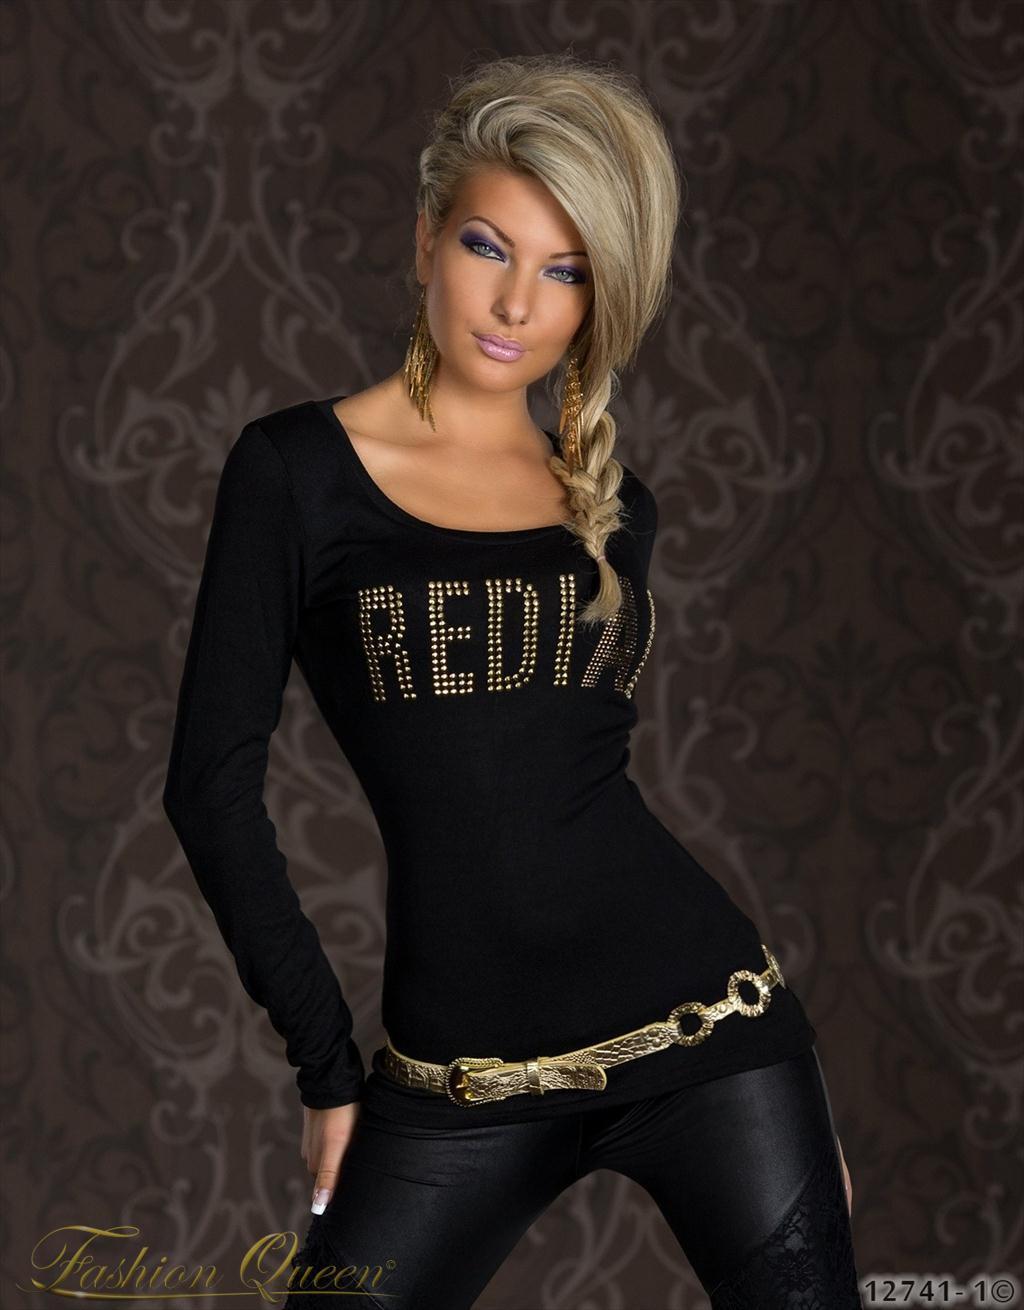 40c3cdb5c971 Fashion Queen - Dámske oblečenie a móda - Svetrík REDIAL